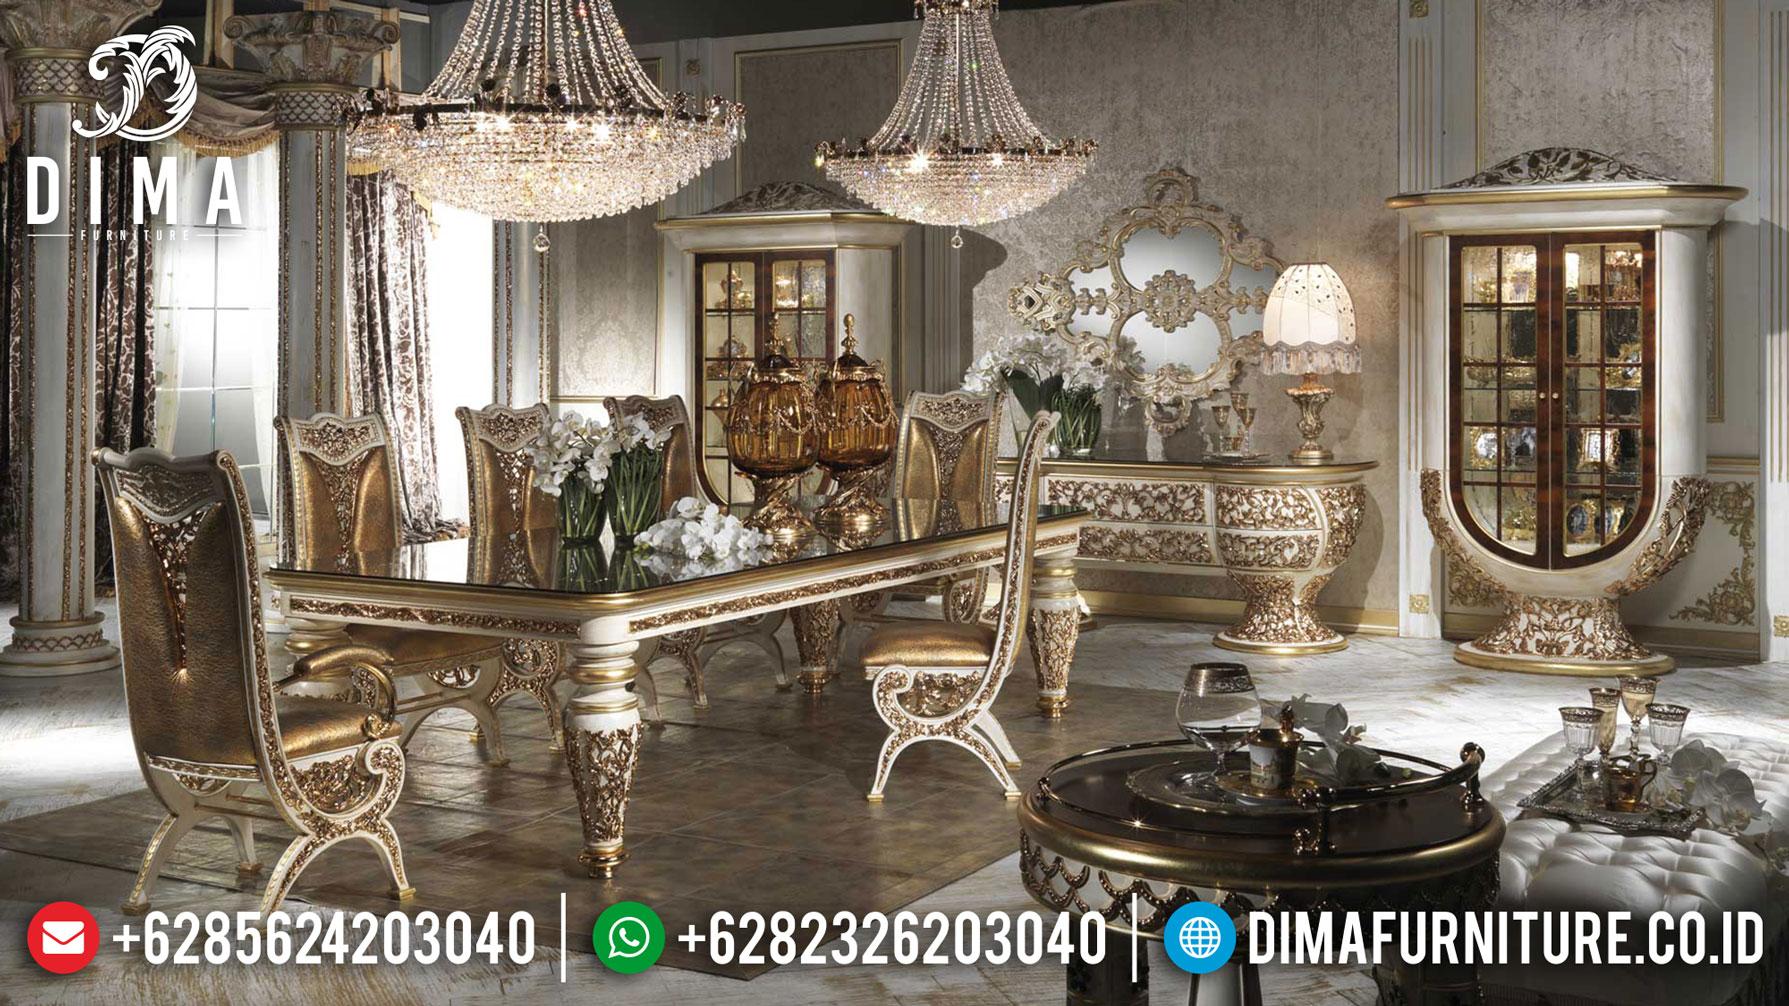 Model Meja Makan Mewah Luxury Classic Jepara Majestic Empire Style Mm-0758